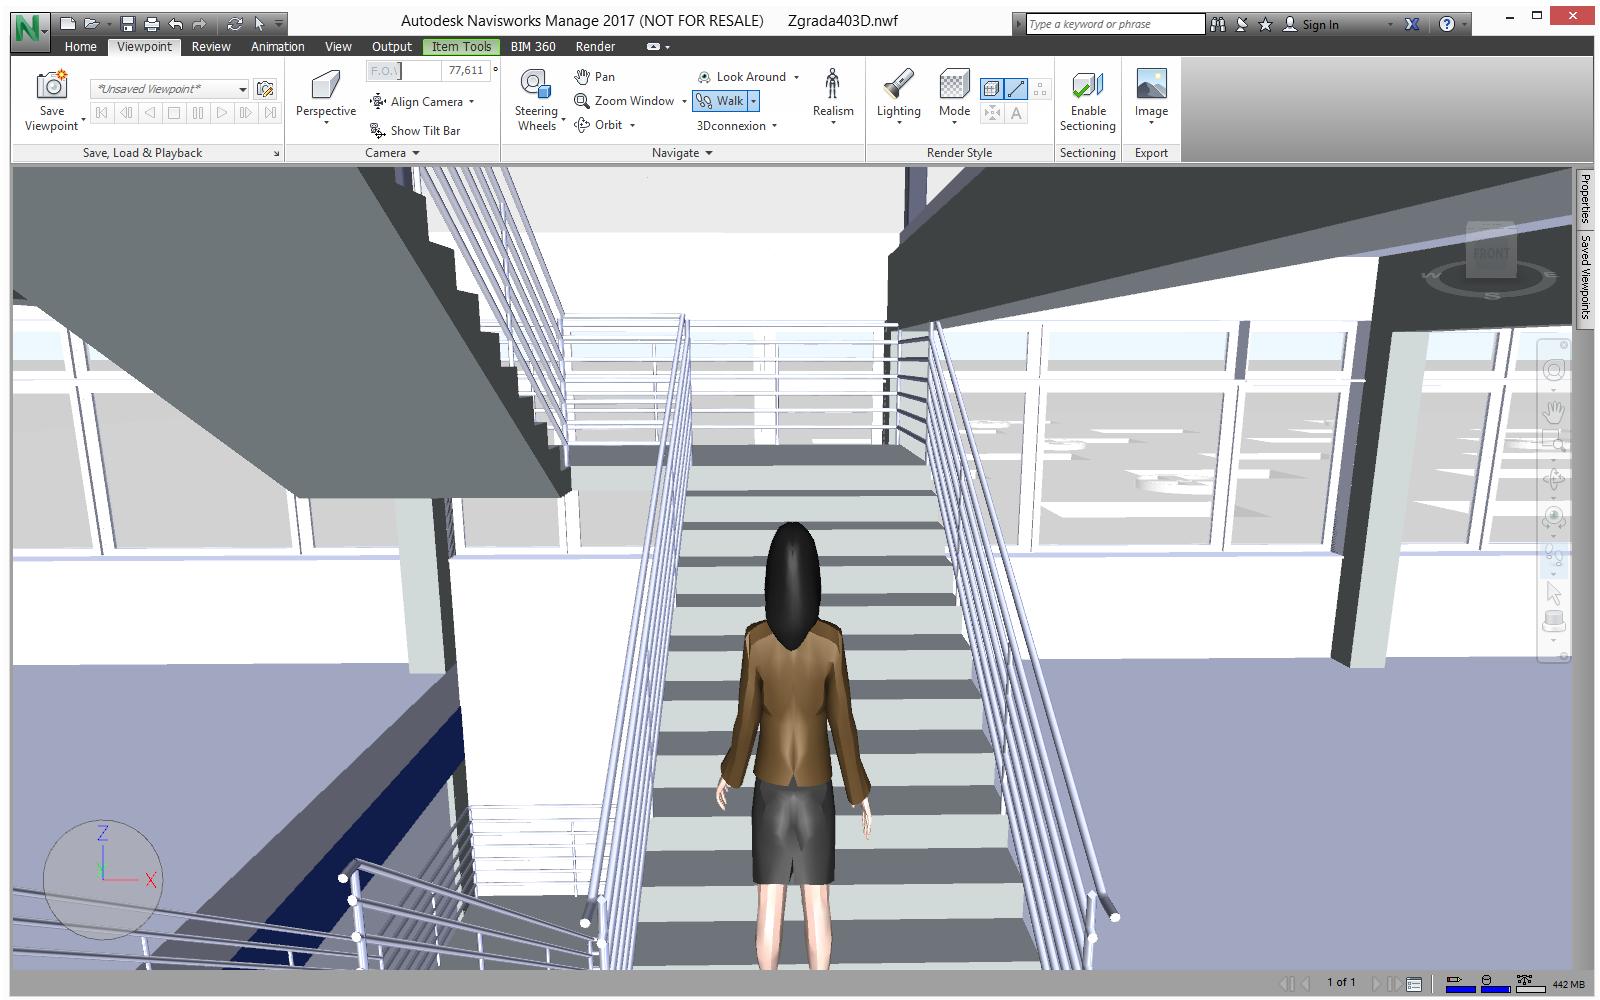 Virtualna šetnja modelom